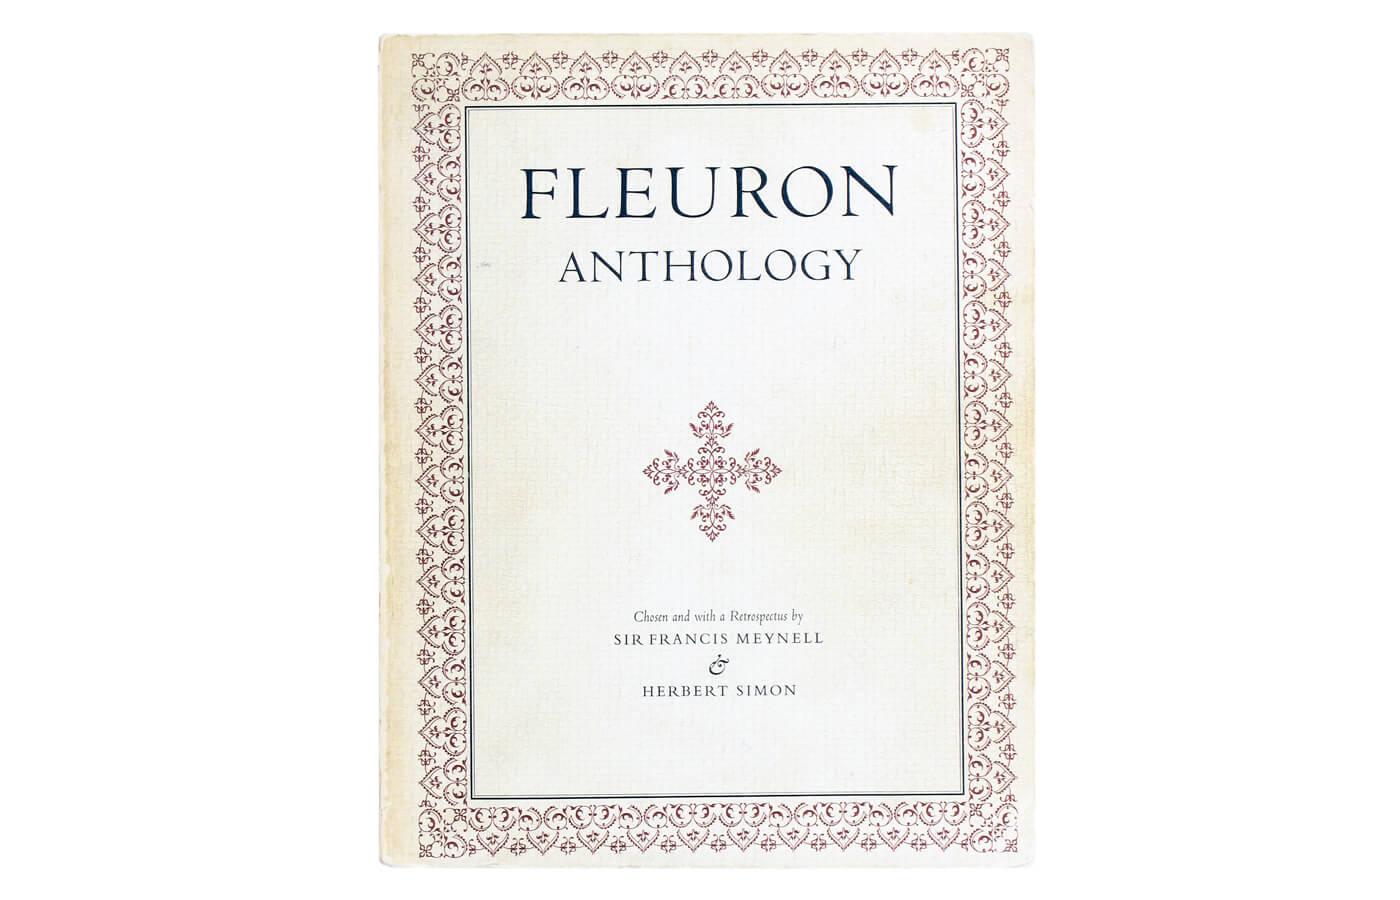 Fleuron Anthology